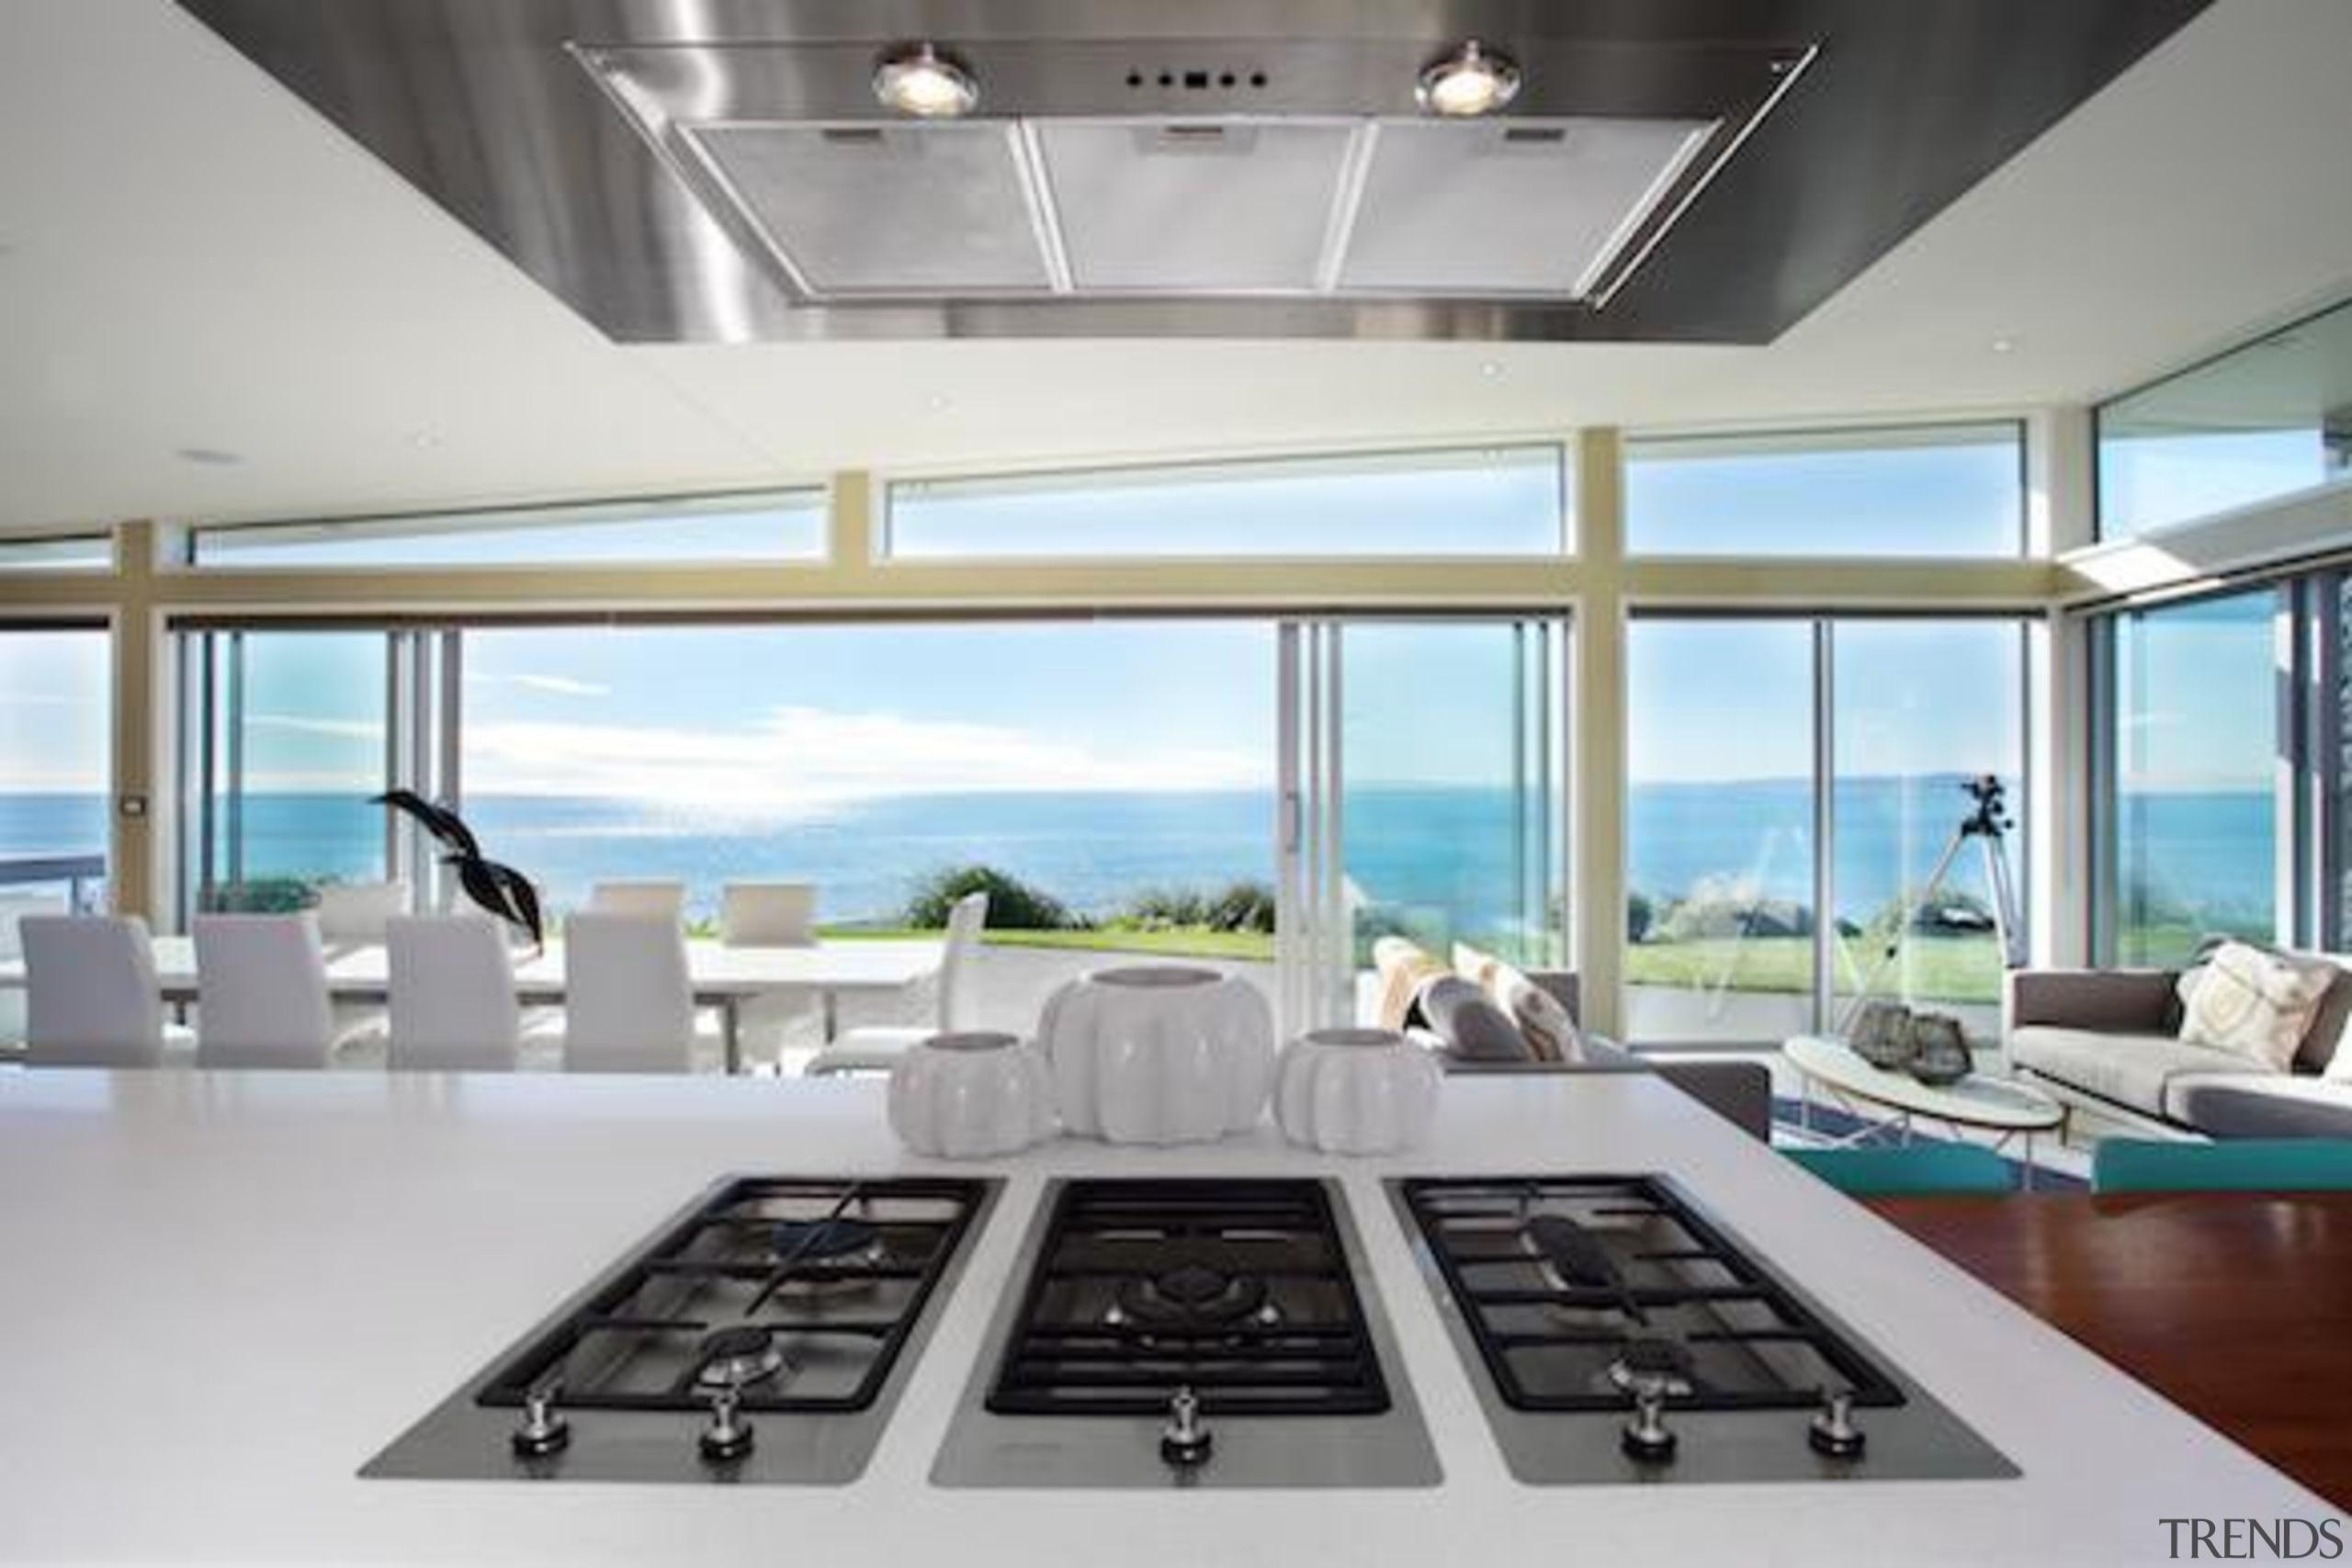 This beautiful kitchen is so full of light! daylighting, interior design, gray, white